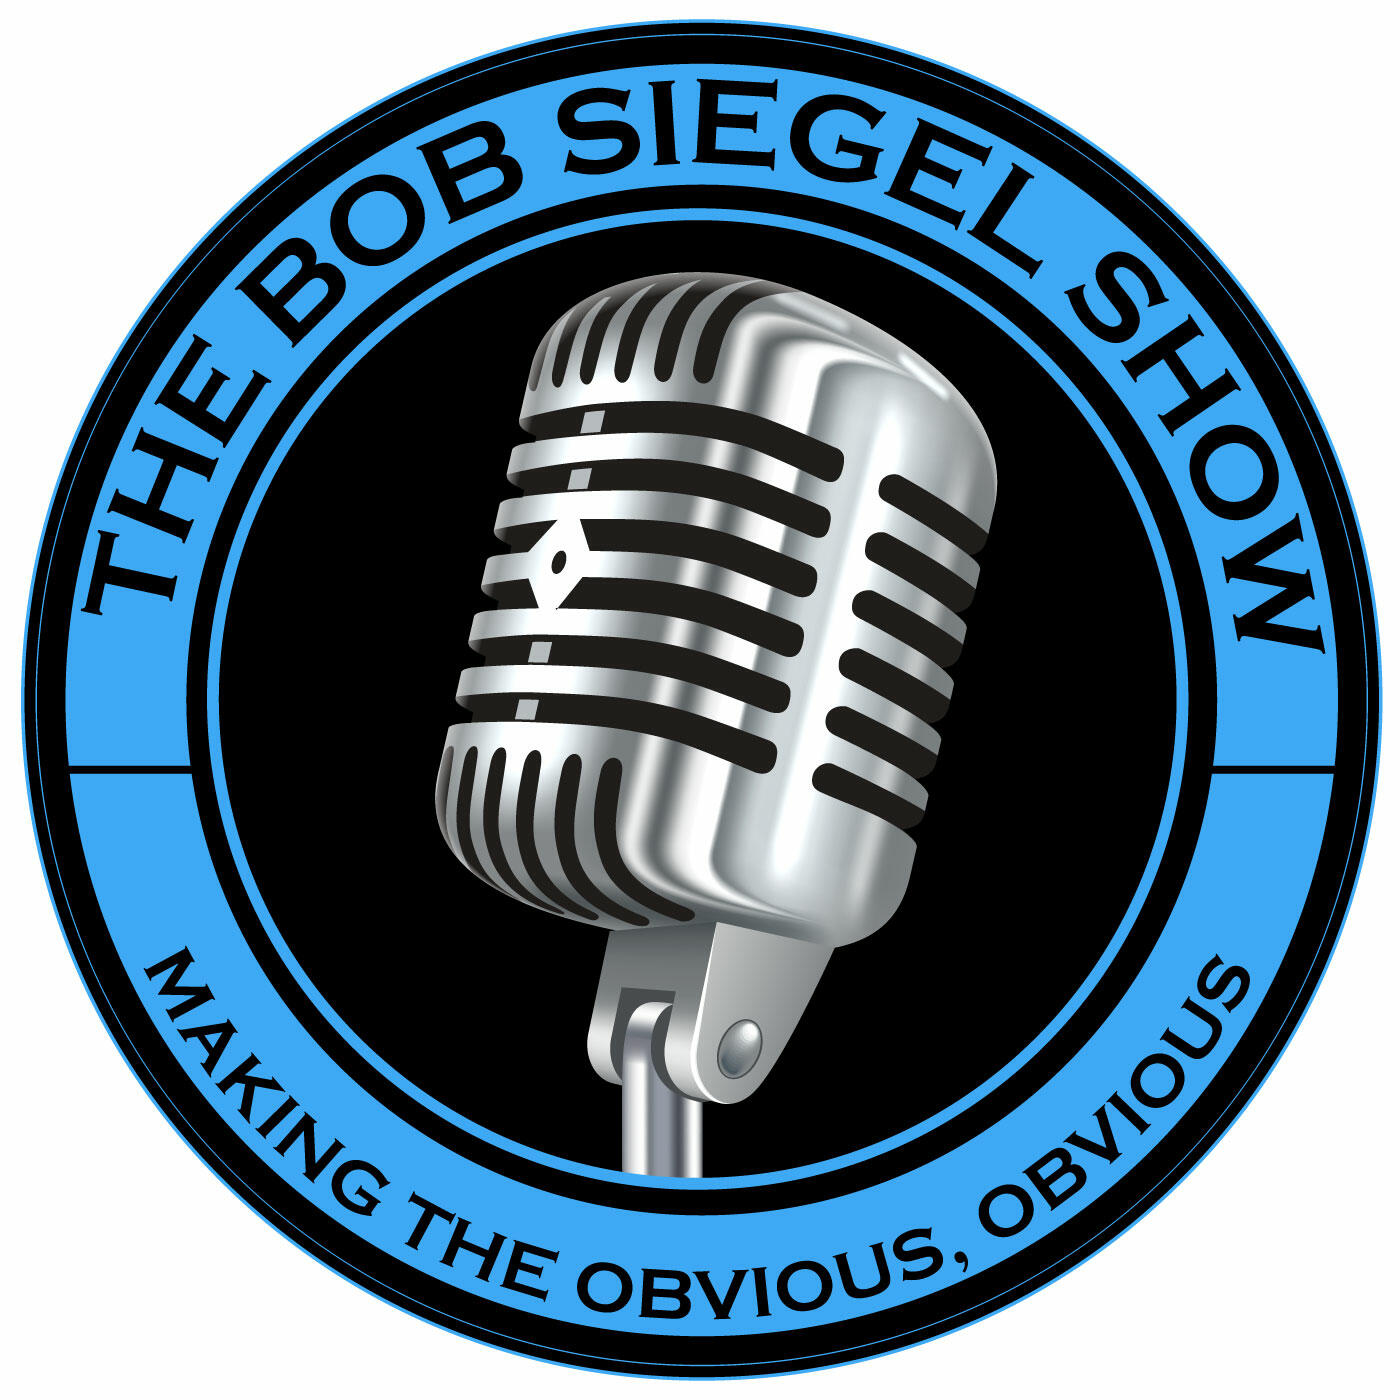 The Bob Siegel Show